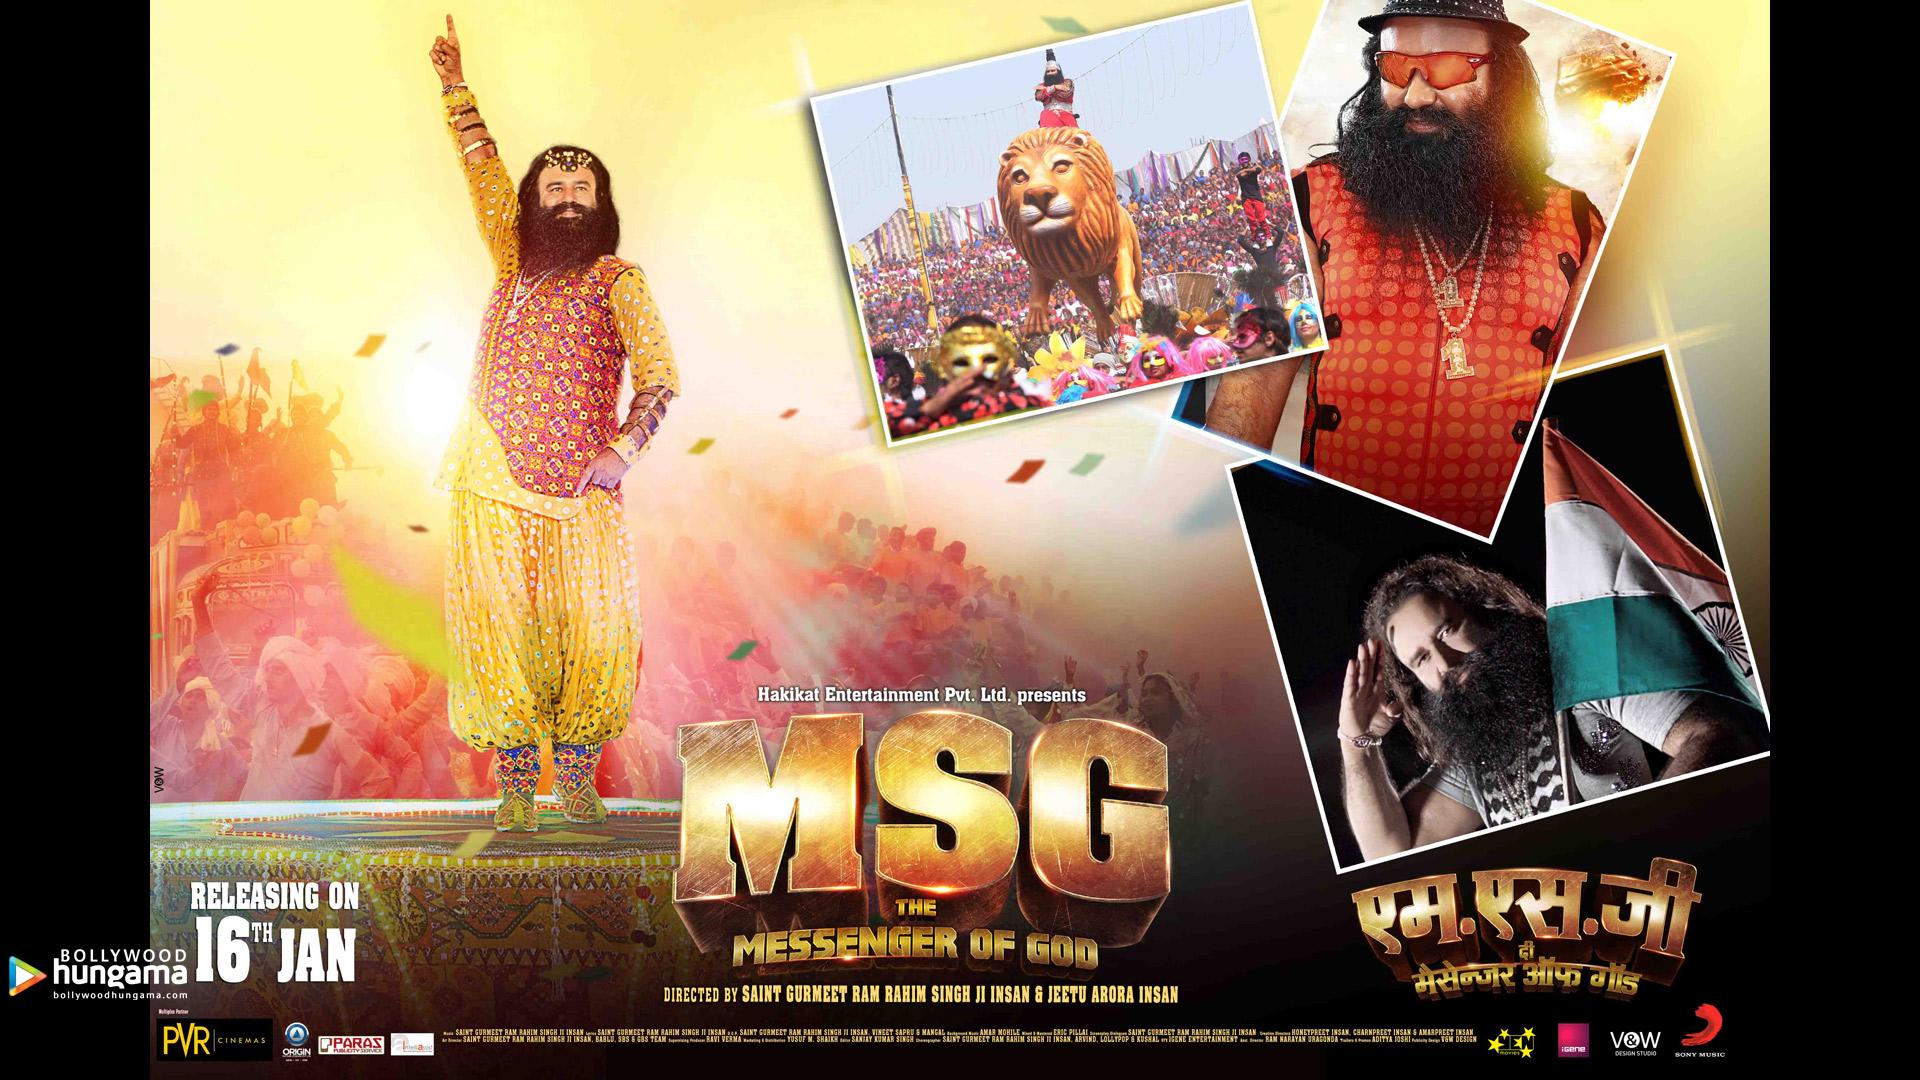 MSG The Messenger 2015 Wallpapers | msg-the-messenger-of-god-2